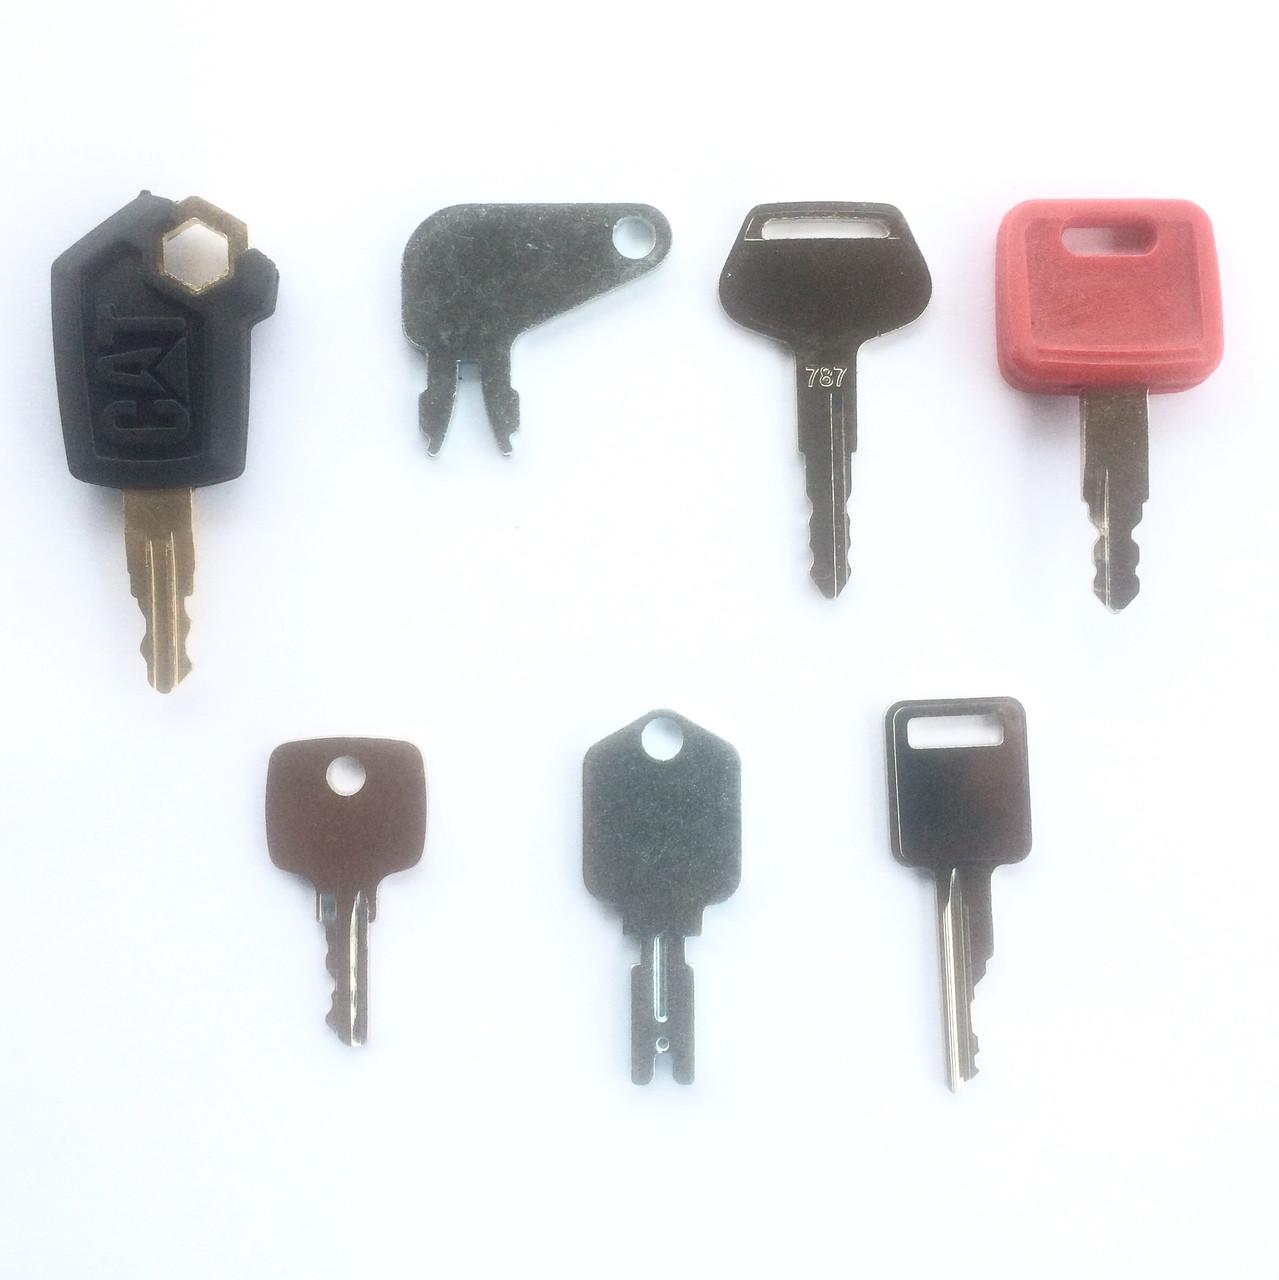 Construction keys set